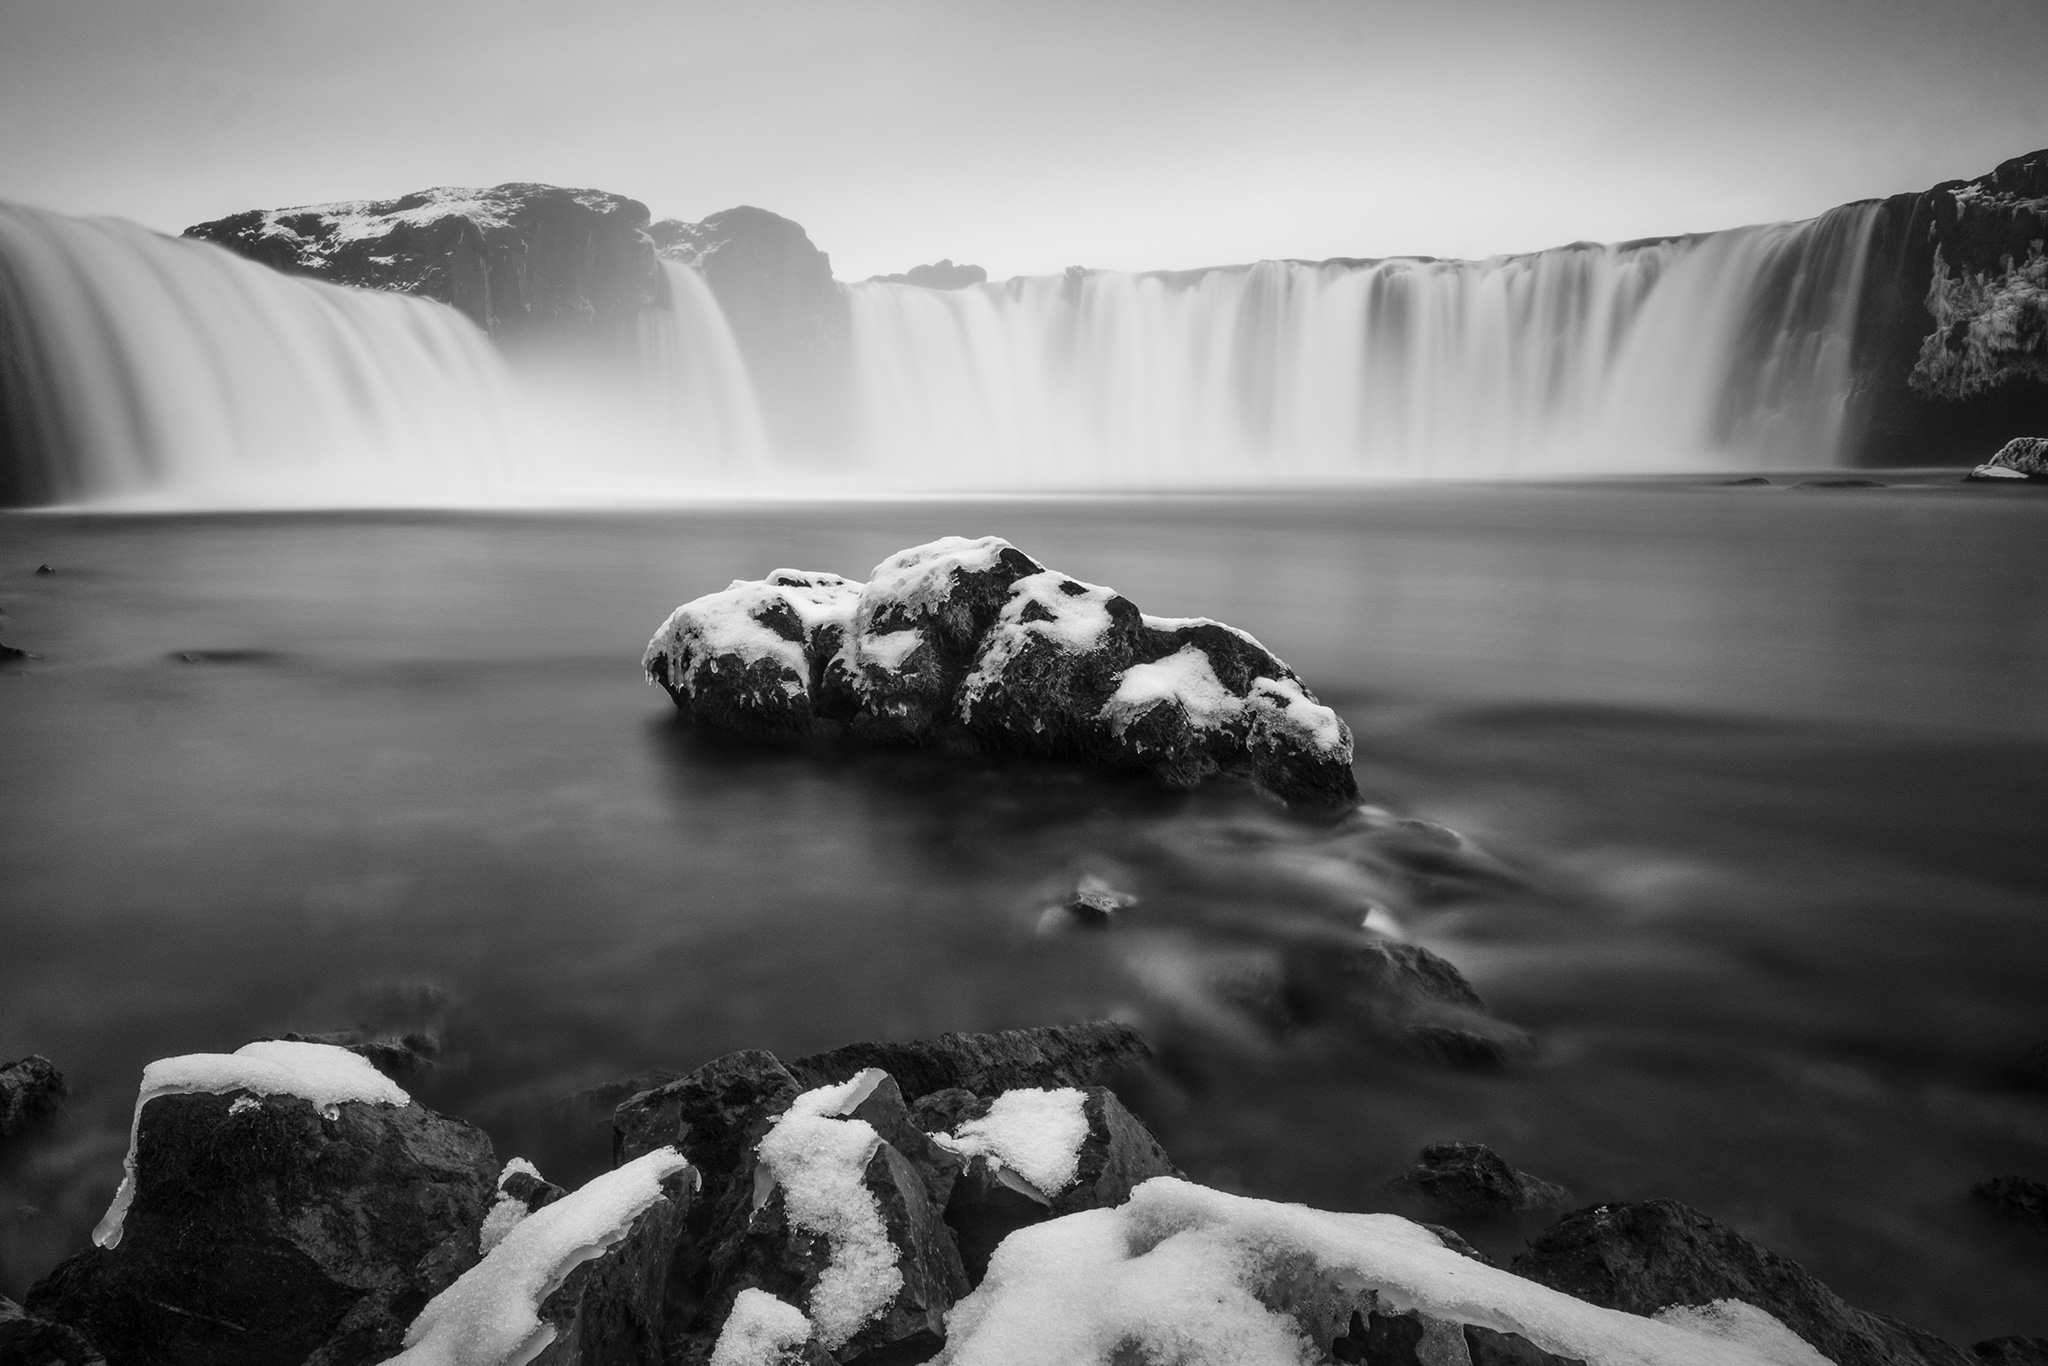 20170406211032_Iceland_By_EjunLow_1396v01.jpg